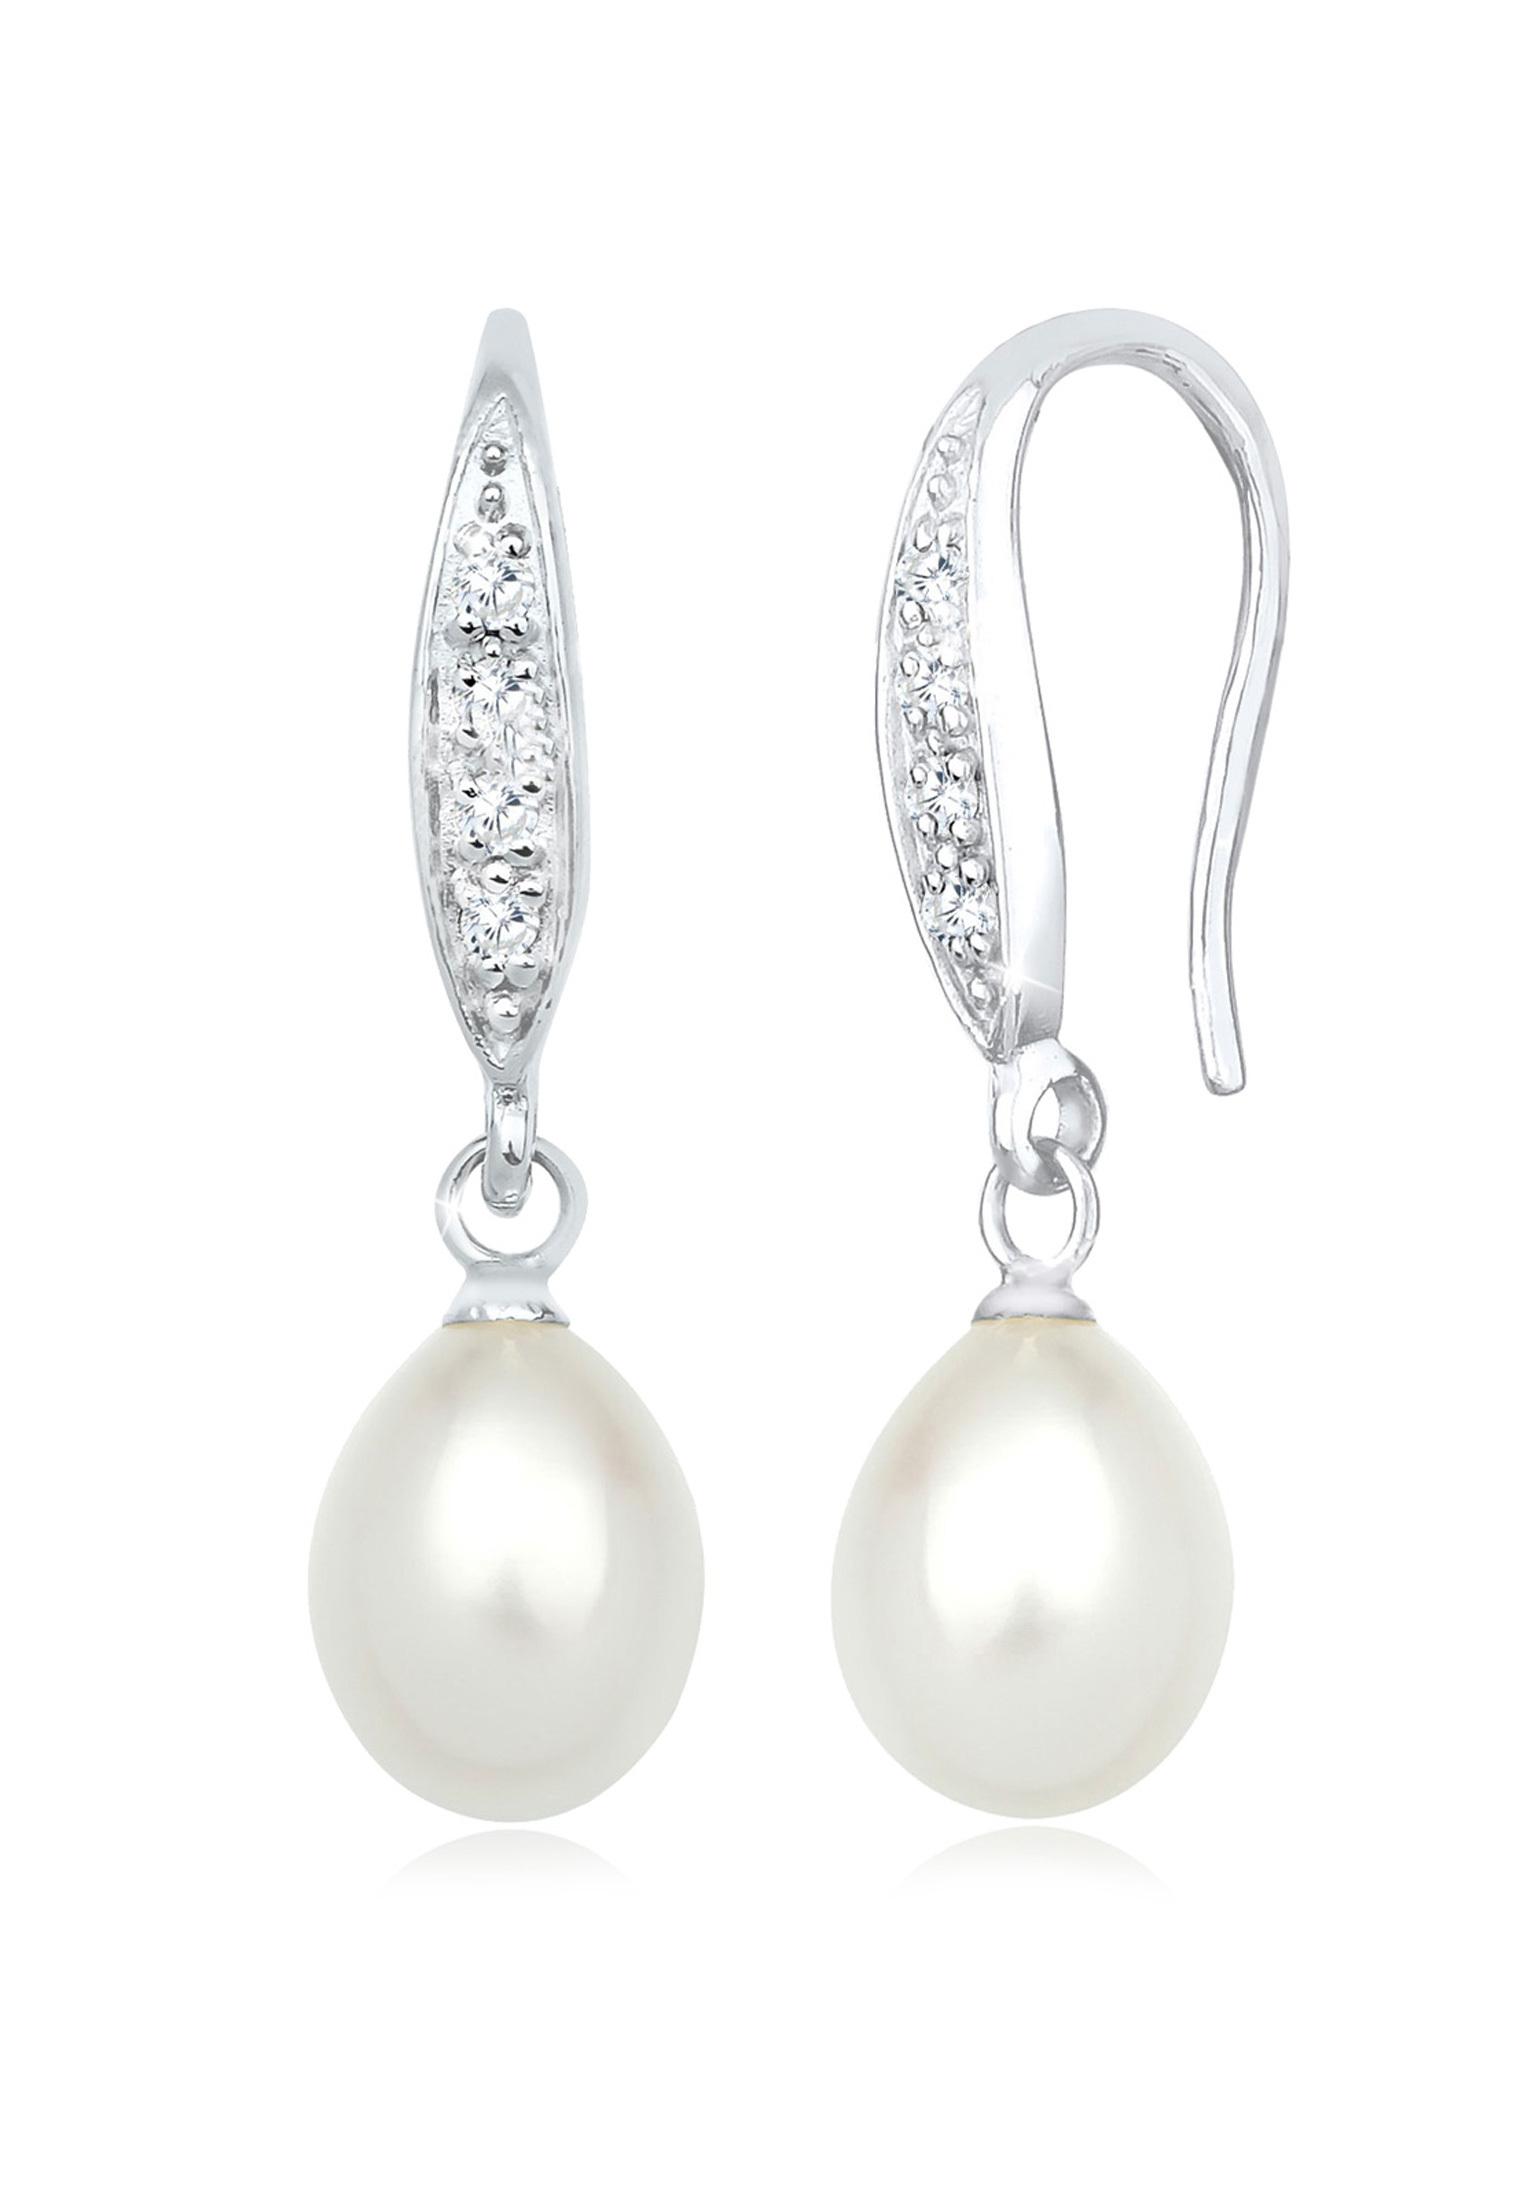 Ohrhänger | Süßwasserperle, Zirkonia ( Weiß ) | 925er Sterling Silber